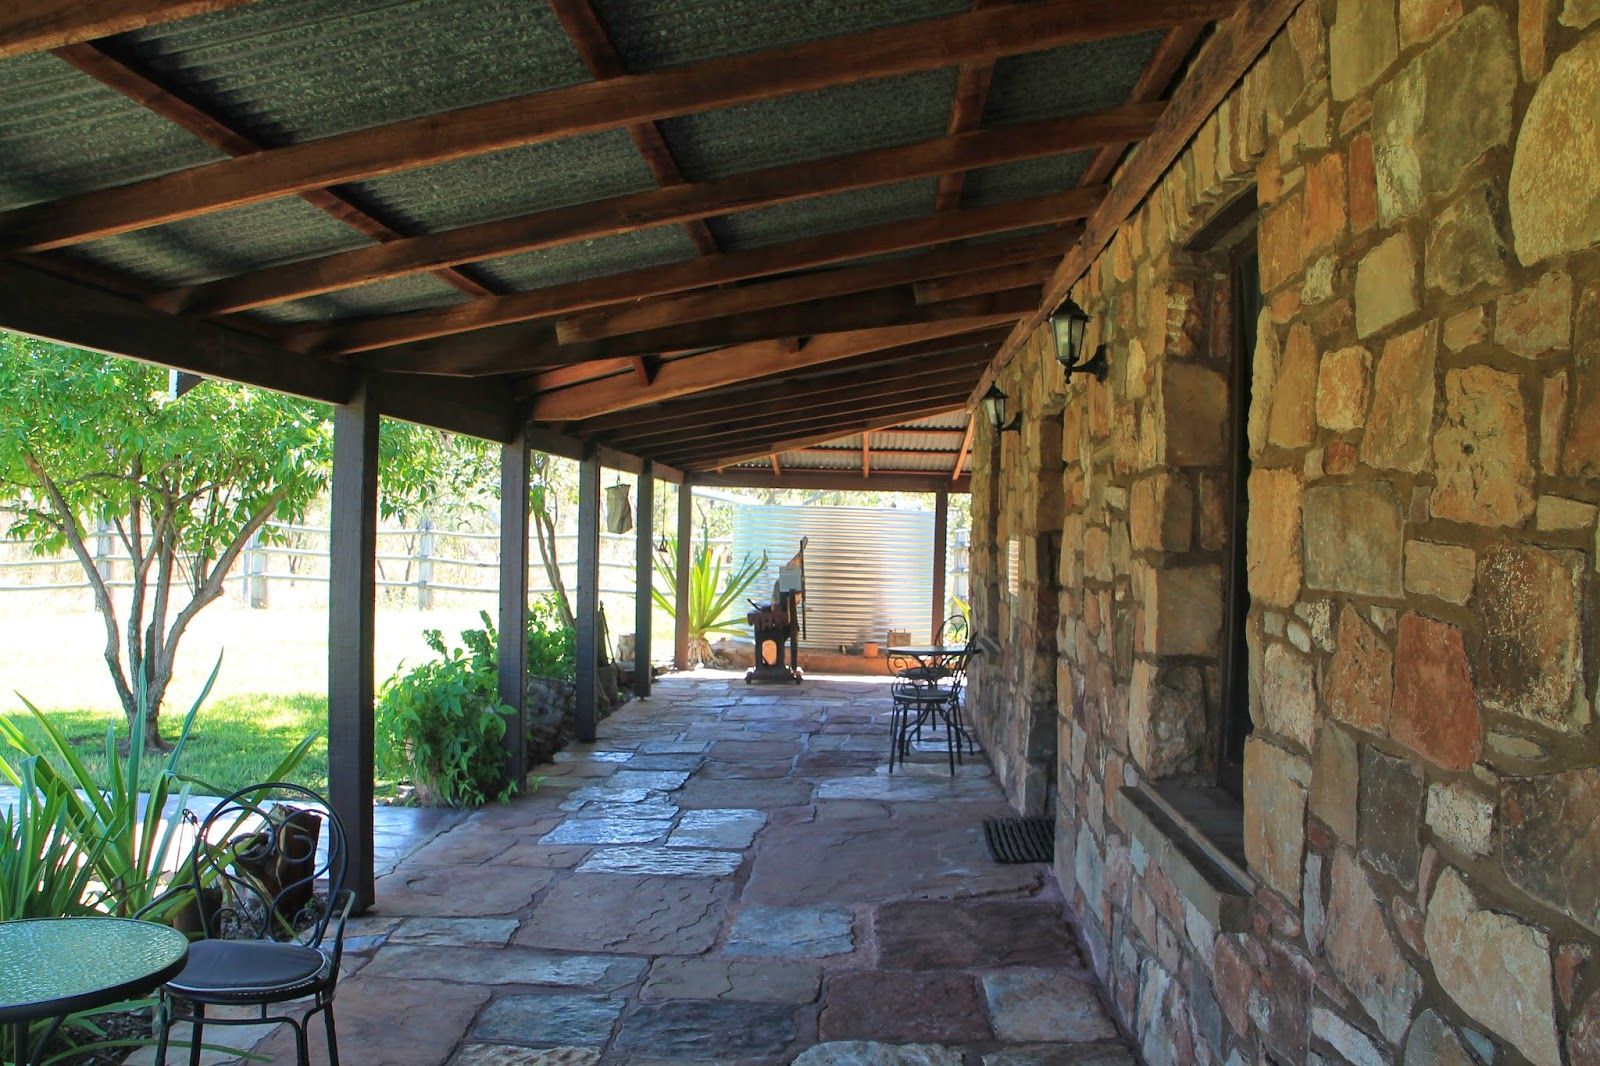 Mary Durack's home. Taken by me at Lake Argyle, WA